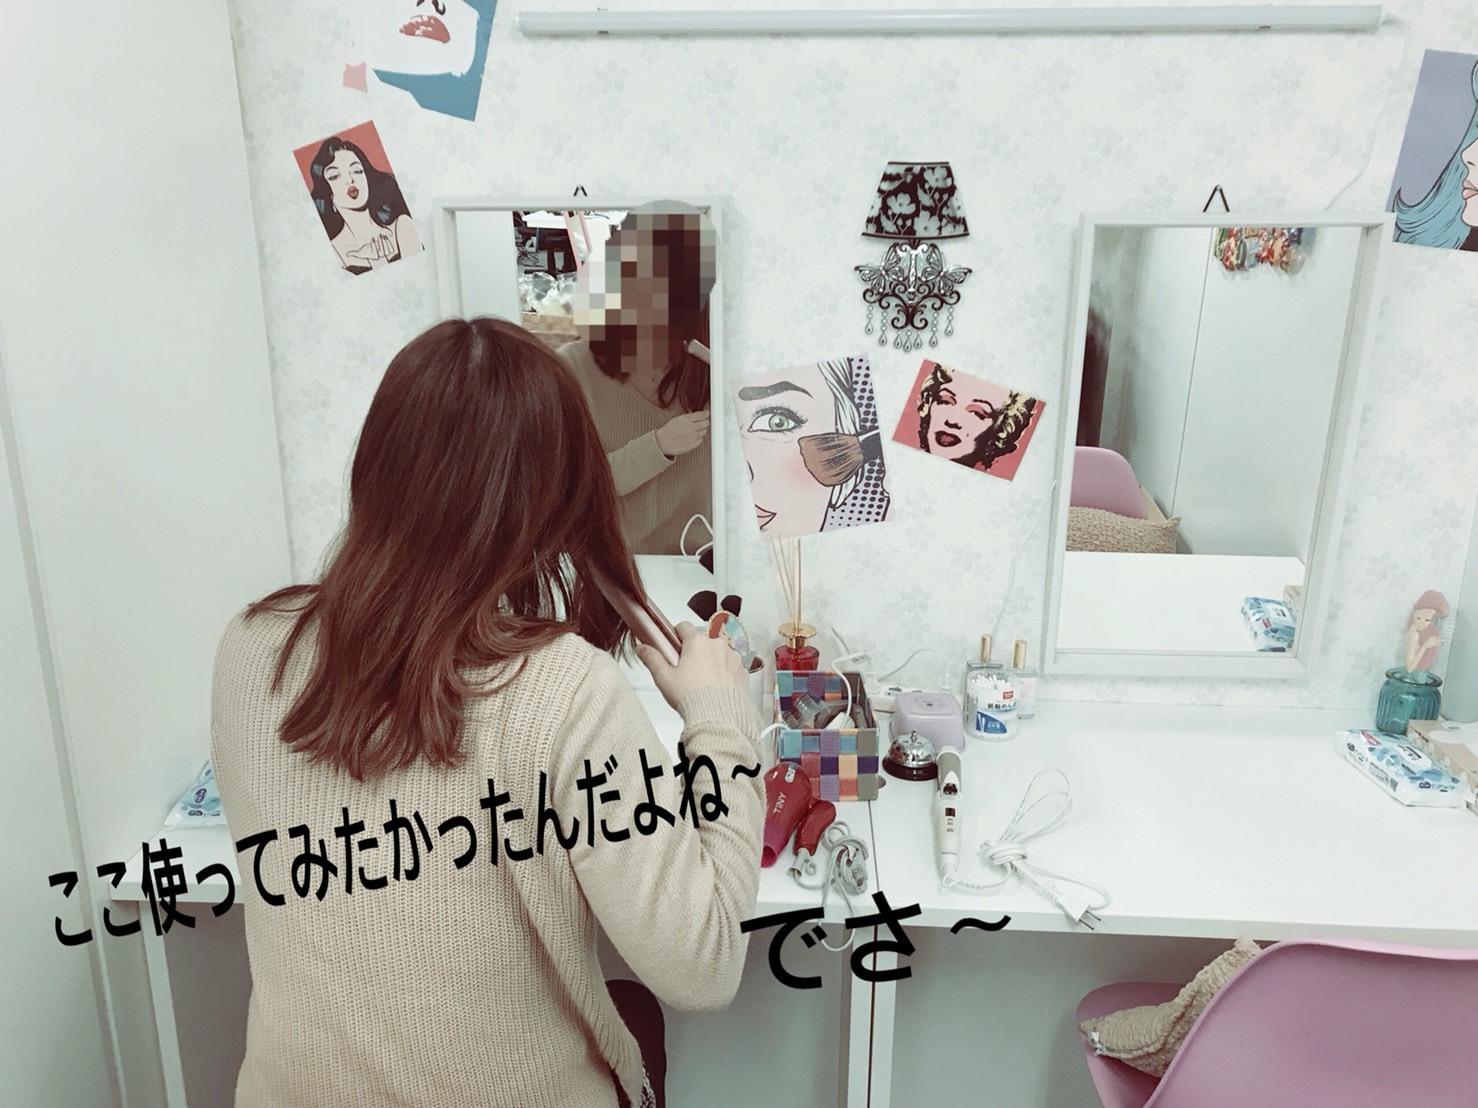 S__30097417.jpg